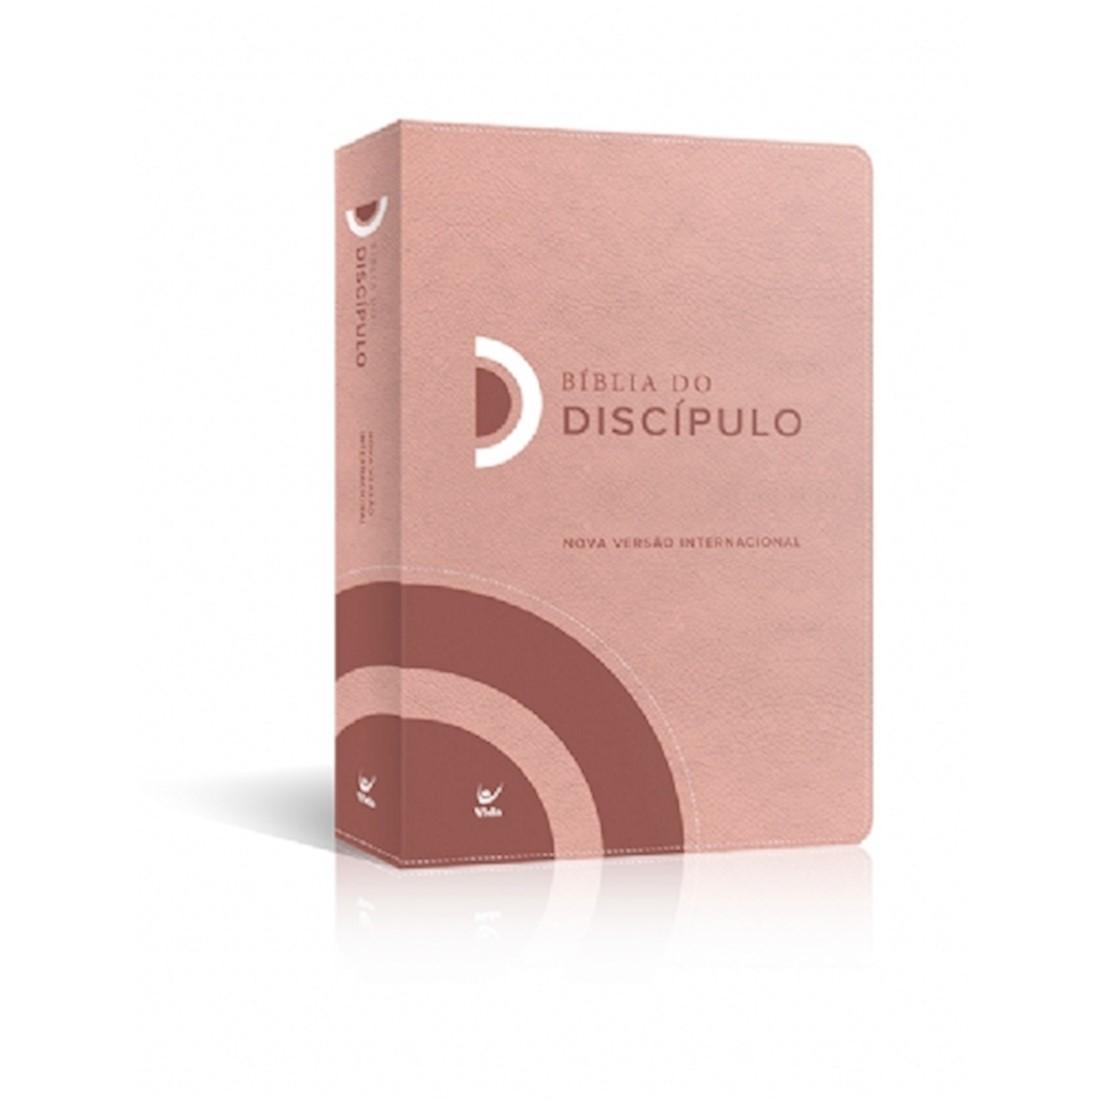 Bíblia do Discípulo NVI Capa Luxo